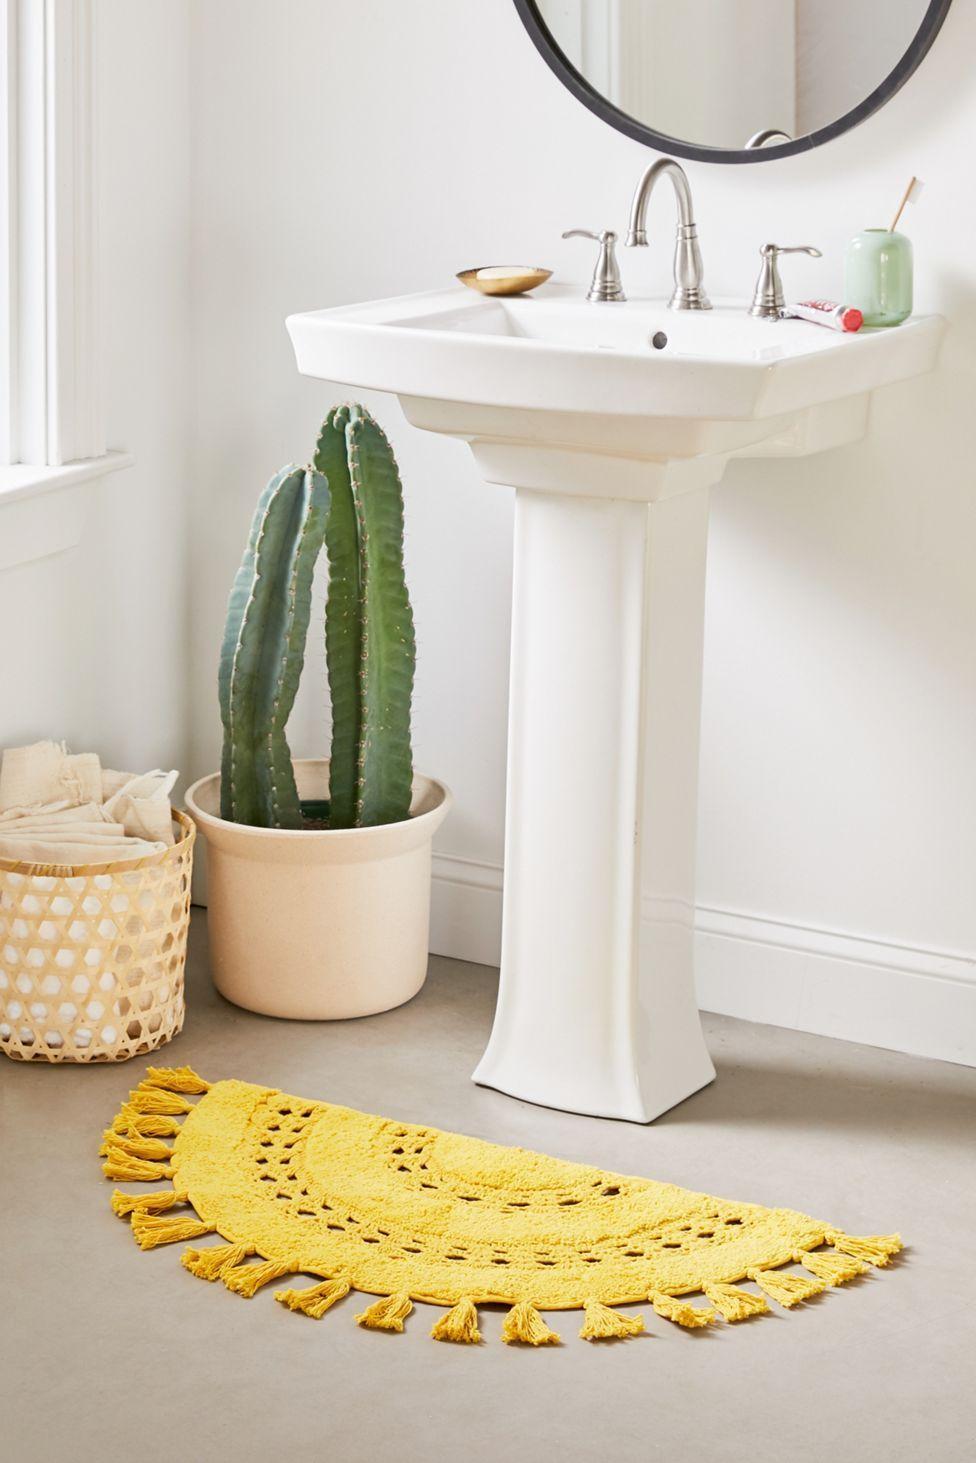 Fiesta Theme Party Discover Crochet Sun Bath Mat Crochet Sun Bath Mat Urban Outfitters Bathroom Rugs Simple Bathroom Decor Small Bathroom Decor [ 1463 x 976 Pixel ]